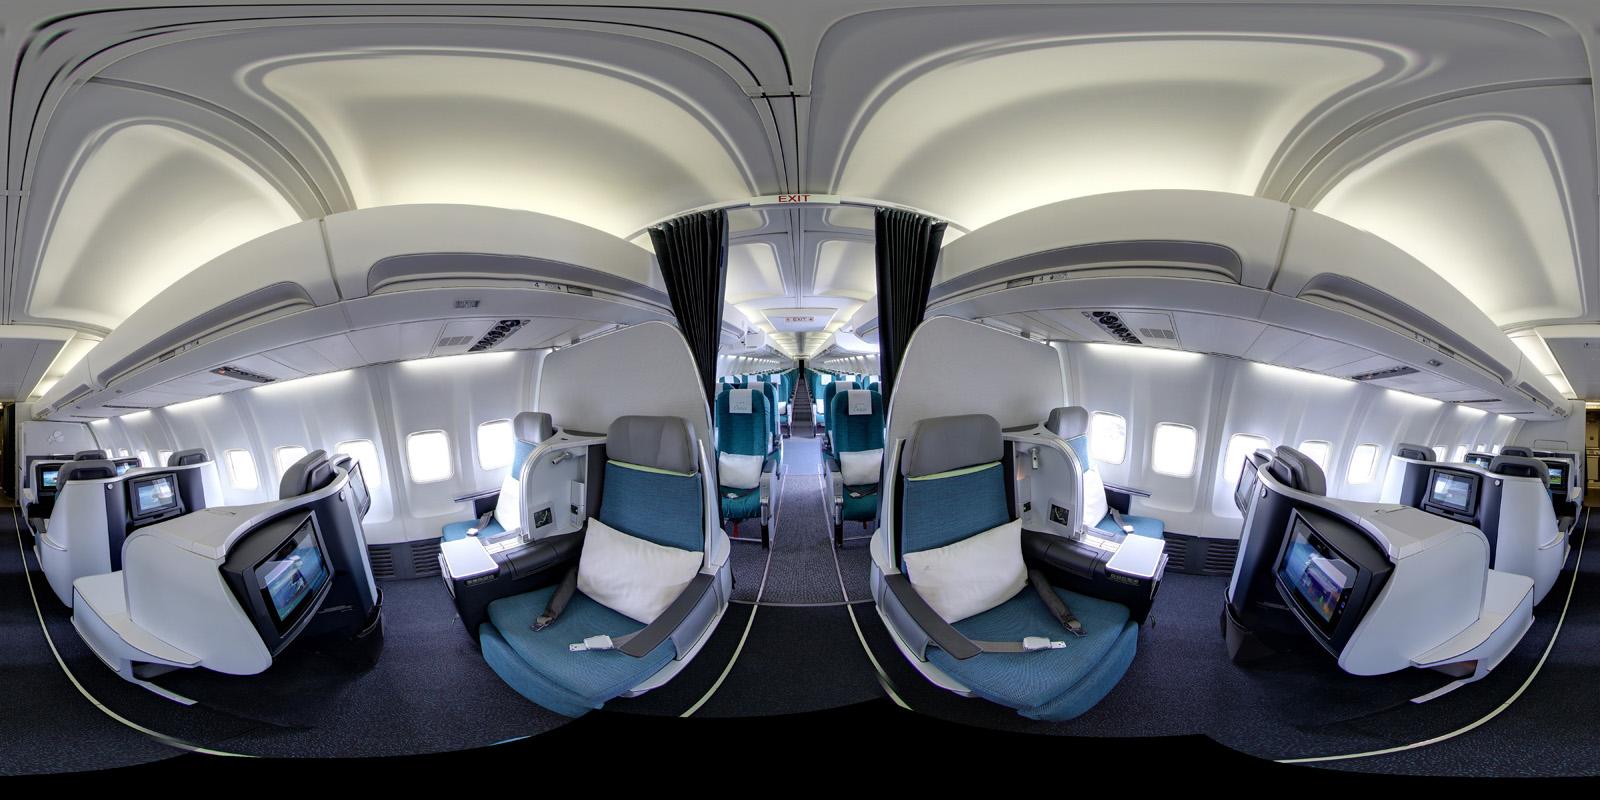 Aer Lingus 757 Business Class Panorama 0343 1200x800JEPG